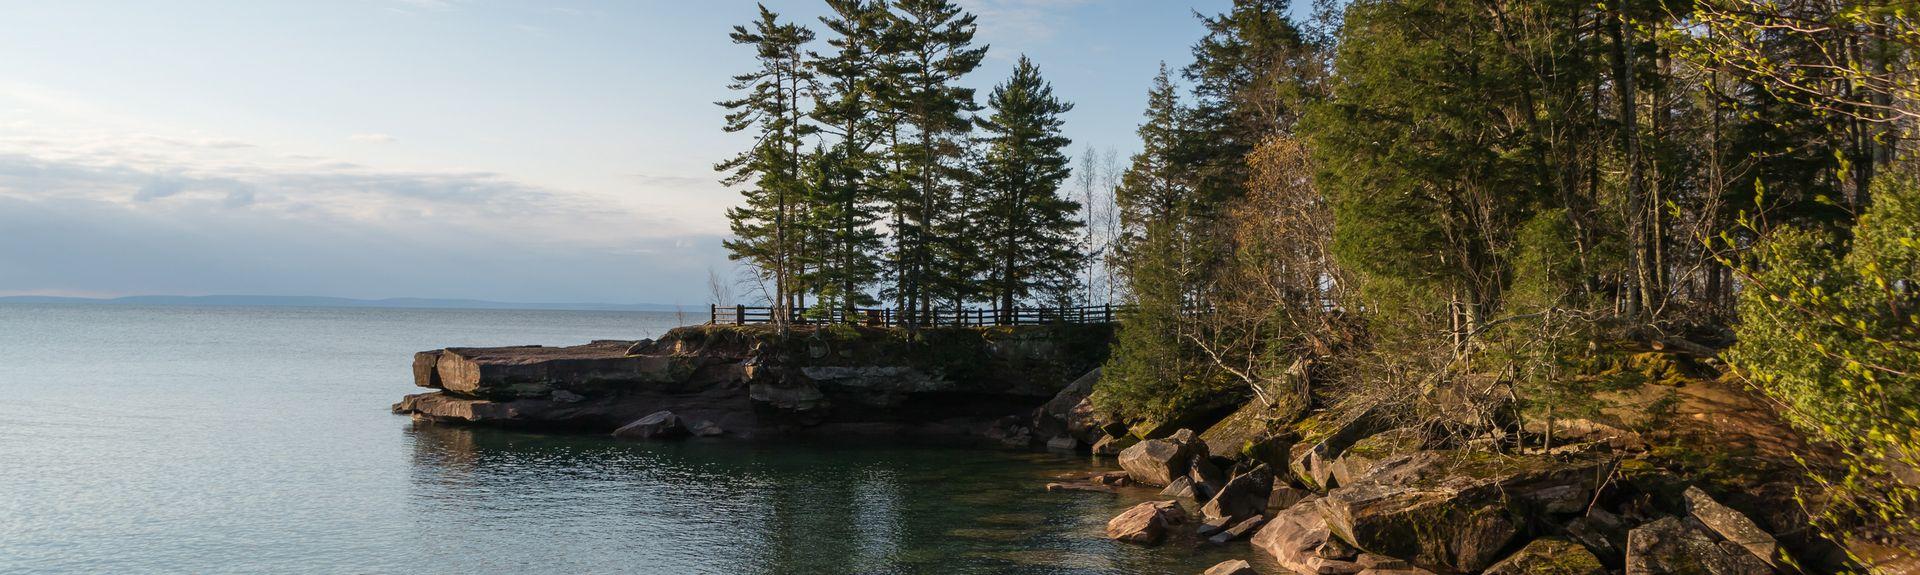 Madeline Island, Wisconsin, United States of America